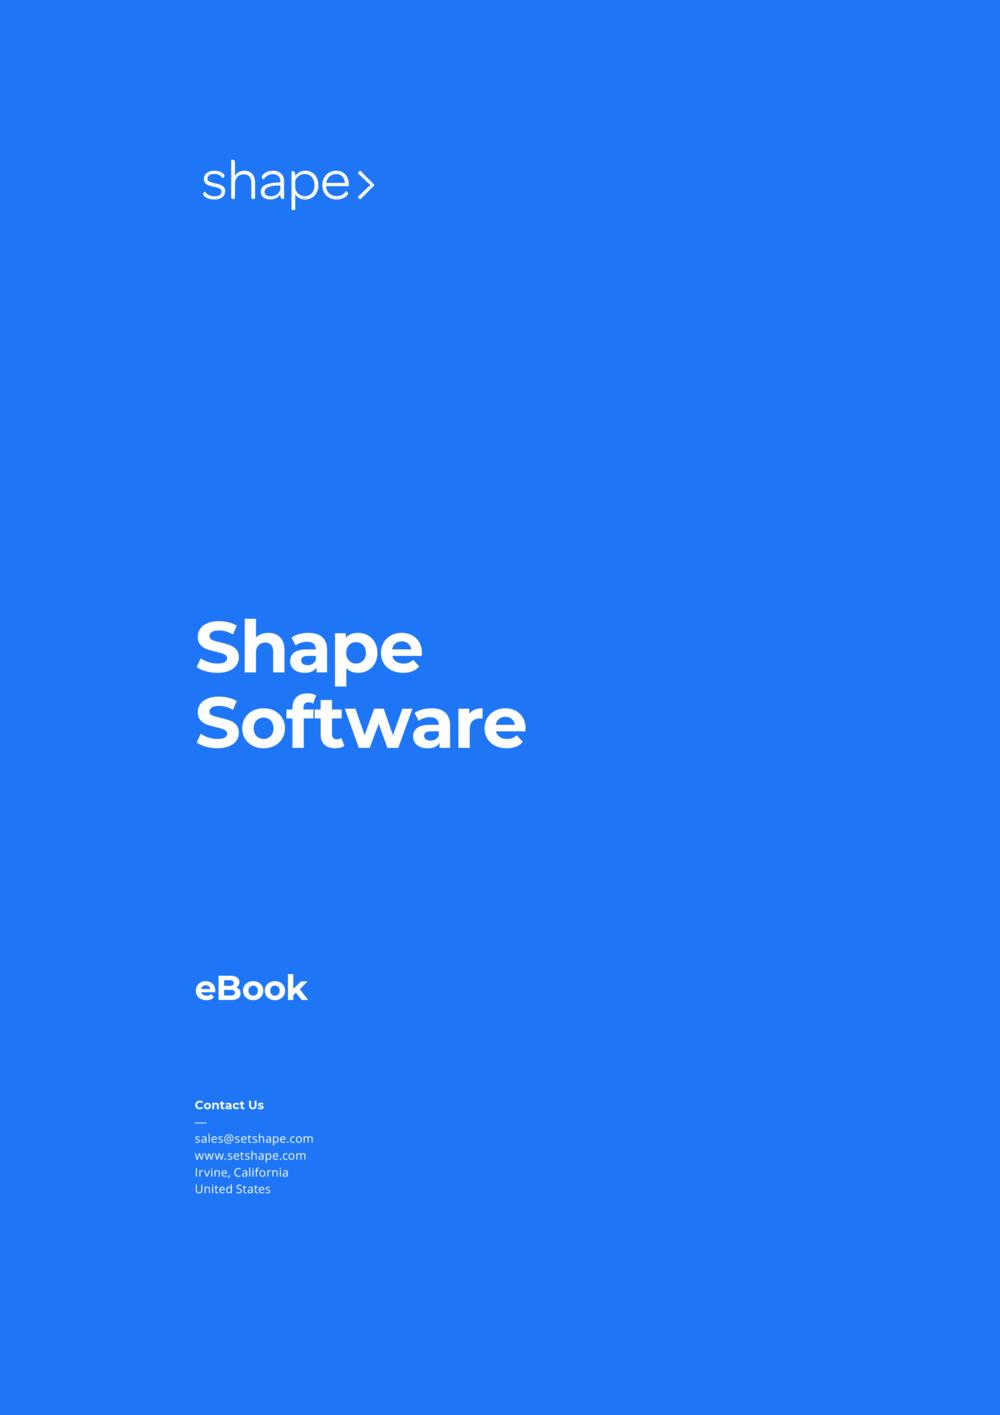 ShapeSoftware_eBook.png